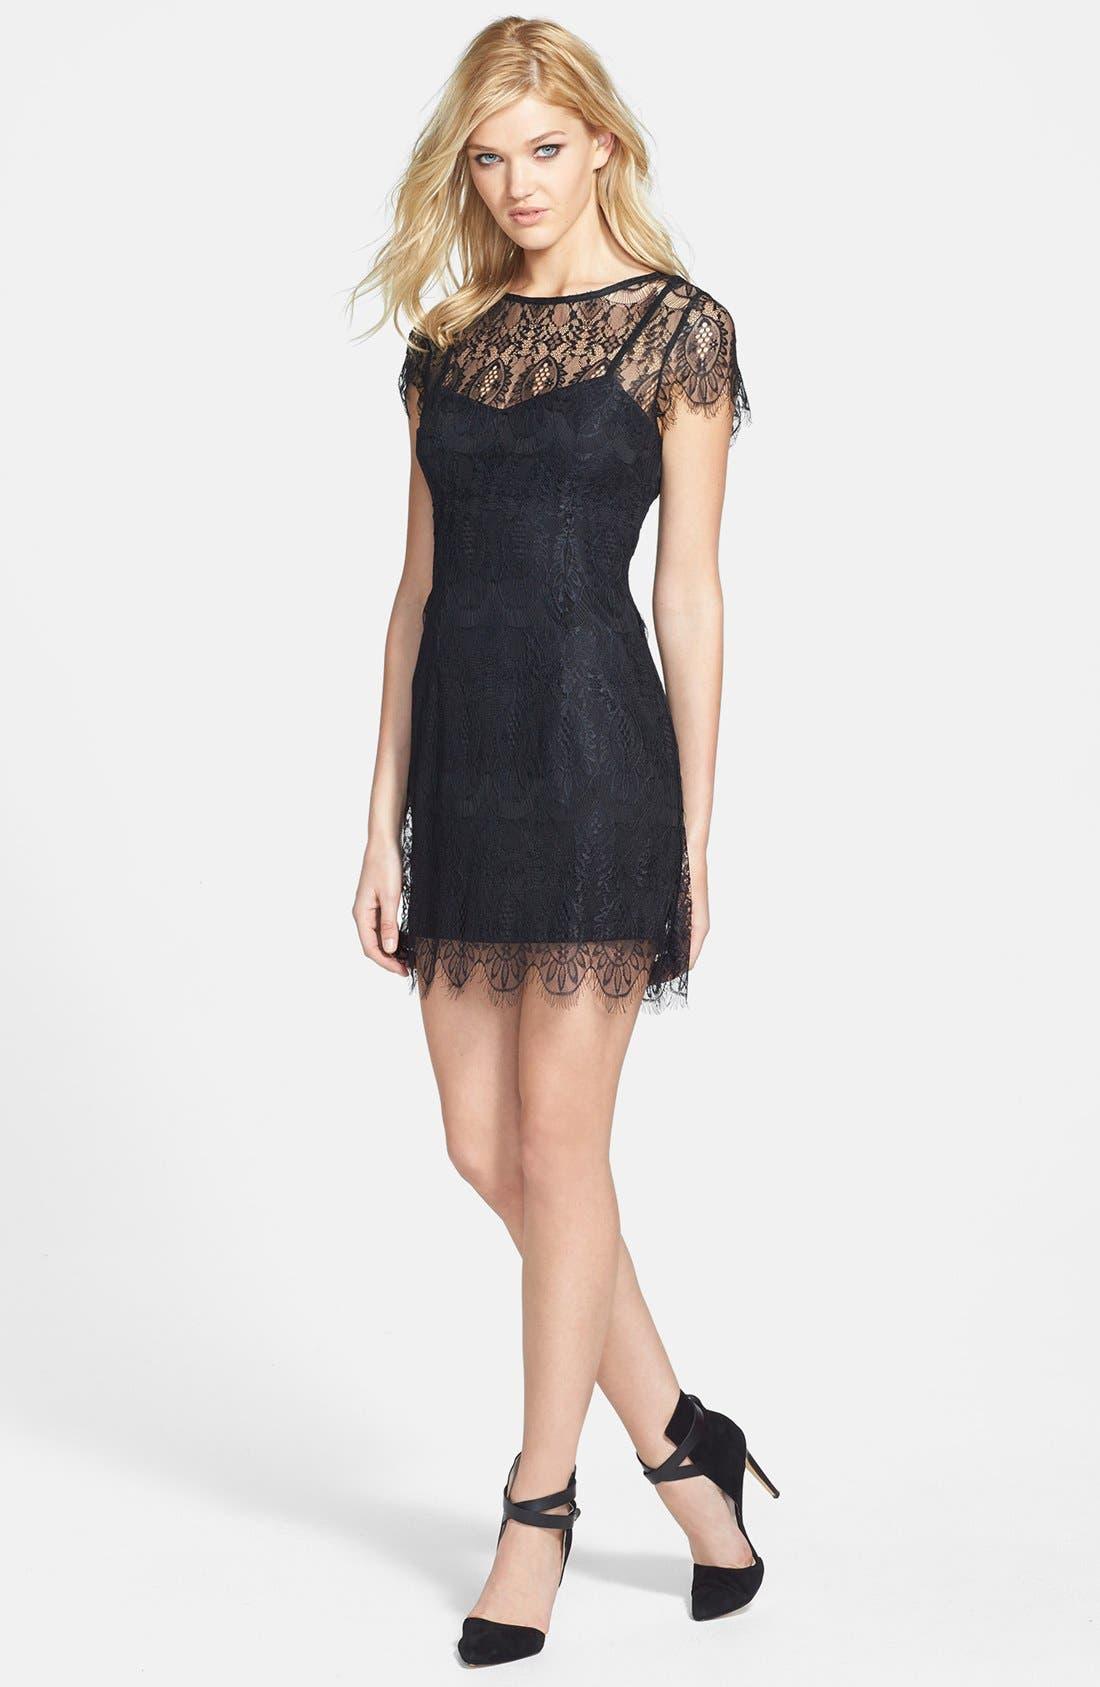 Alternate Image 1 Selected - MINKPINK 'Surrender' Illusion Yoke Lace Dress